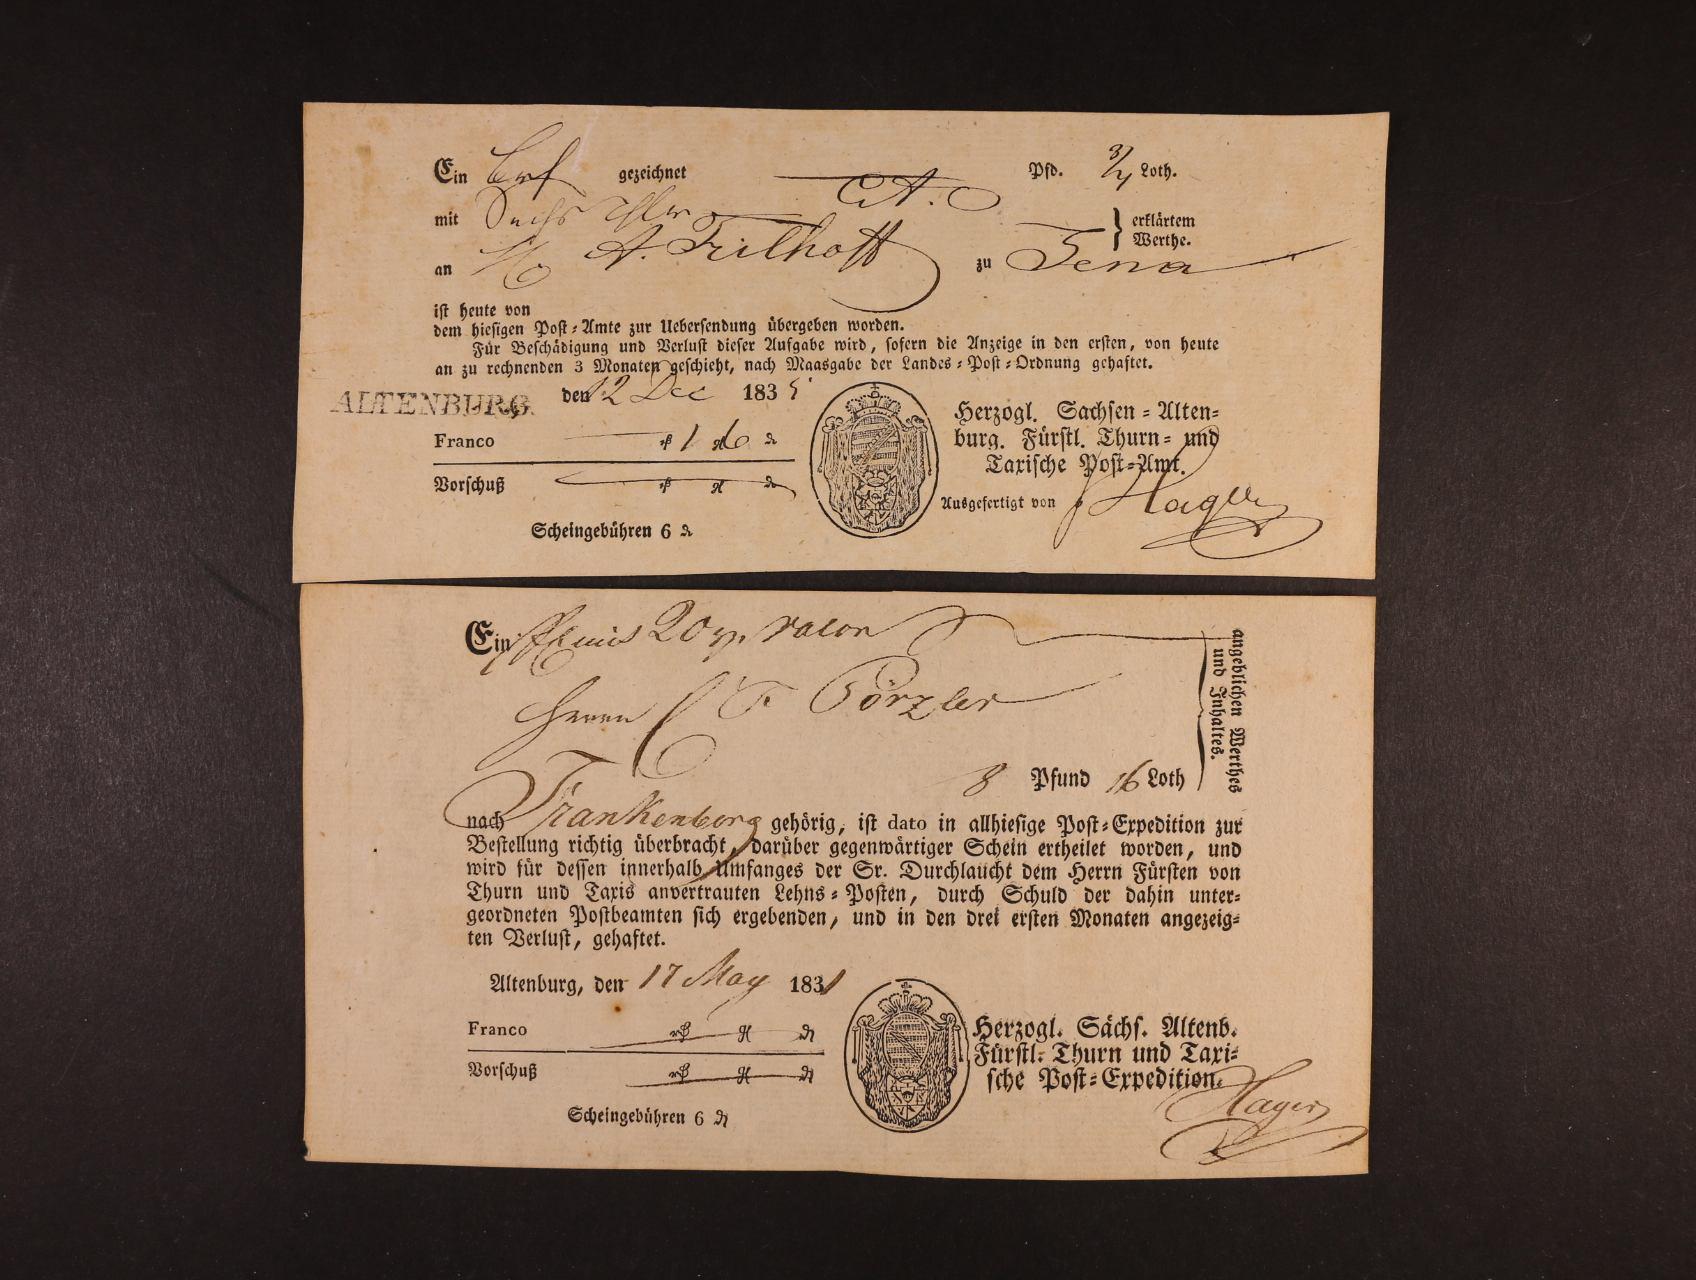 Thurn Taxis - 2 pod. lístky knížecí pošty Thurn-Taxis z let 1831 a 1834, 1x s raz. ALTENBURG